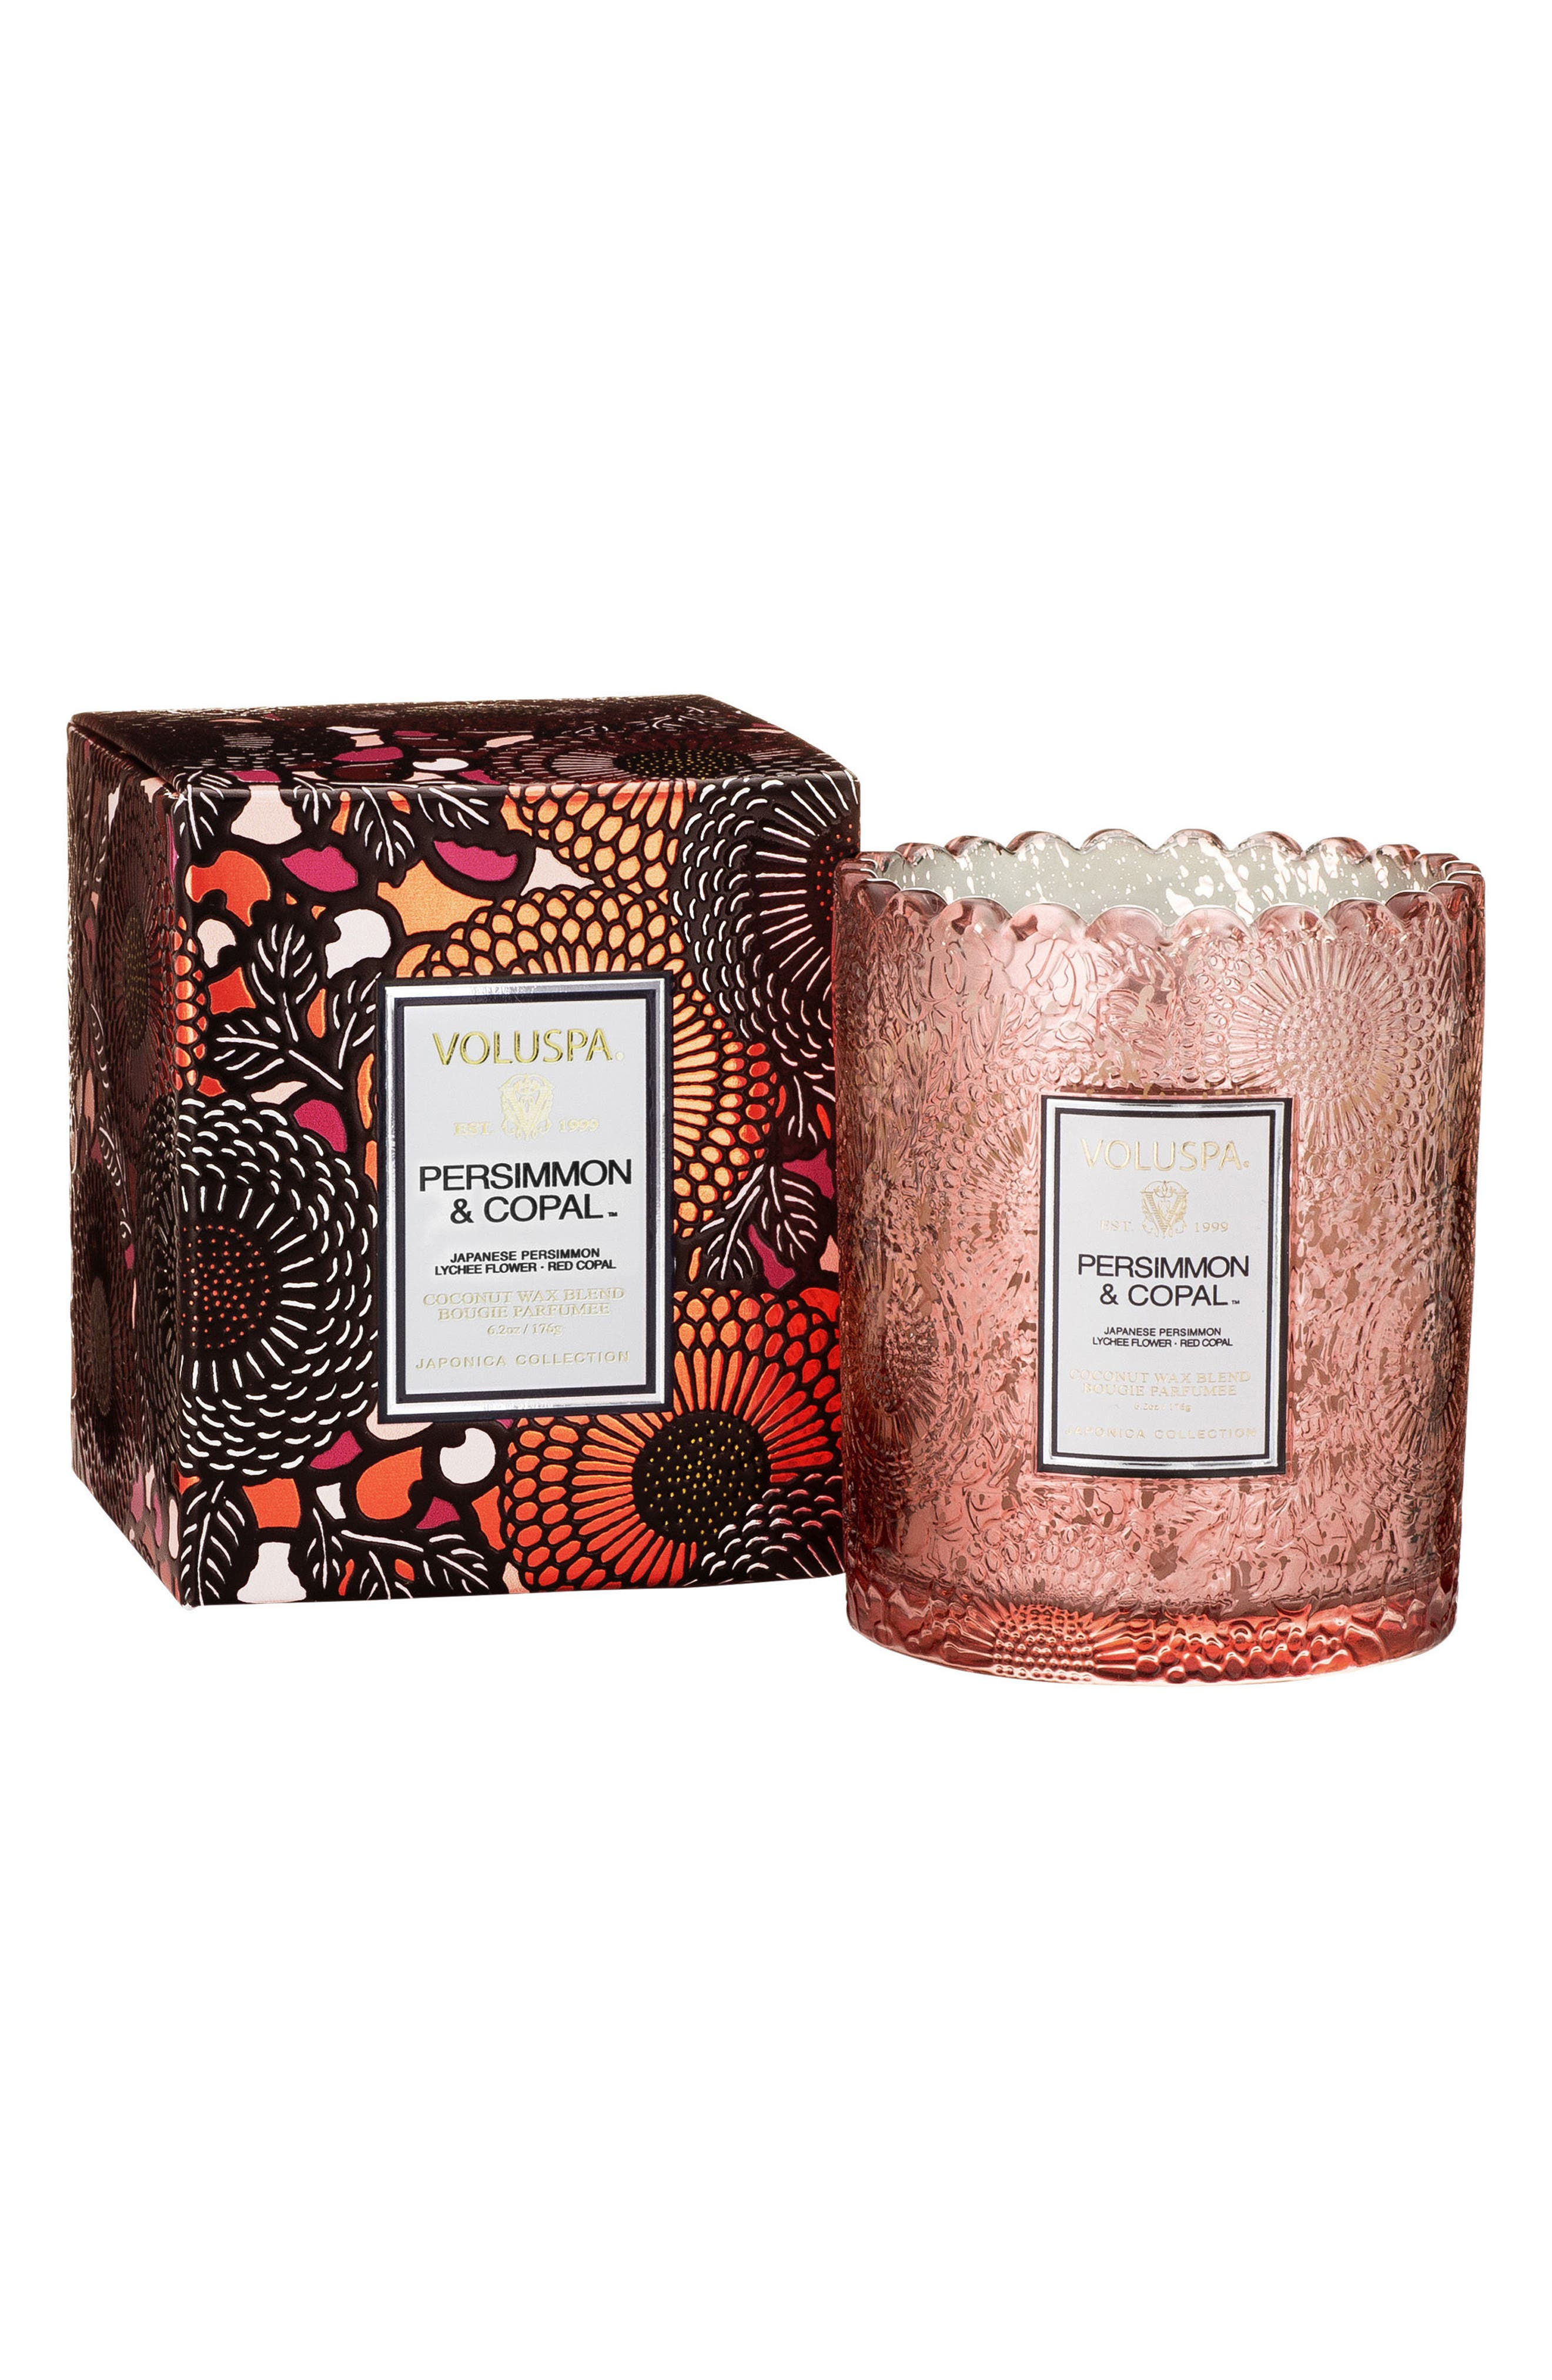 Japonica - Persimmon & Copal Scalloped Edge Glass Candle,                         Main,                         color, Persimmon/ Copal